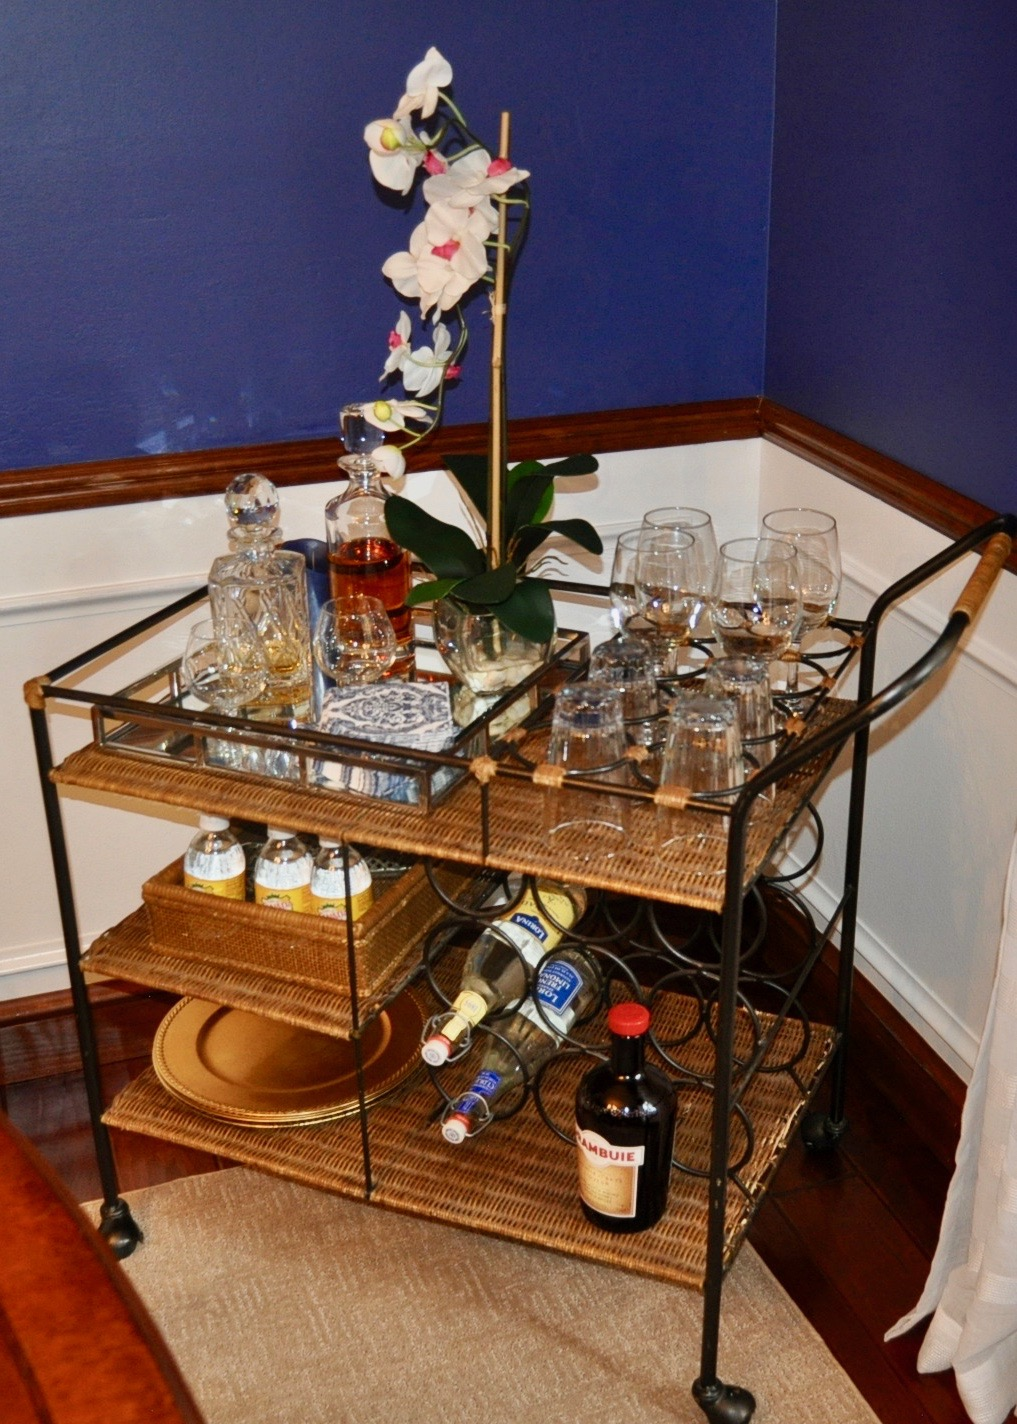 Staged bar cart